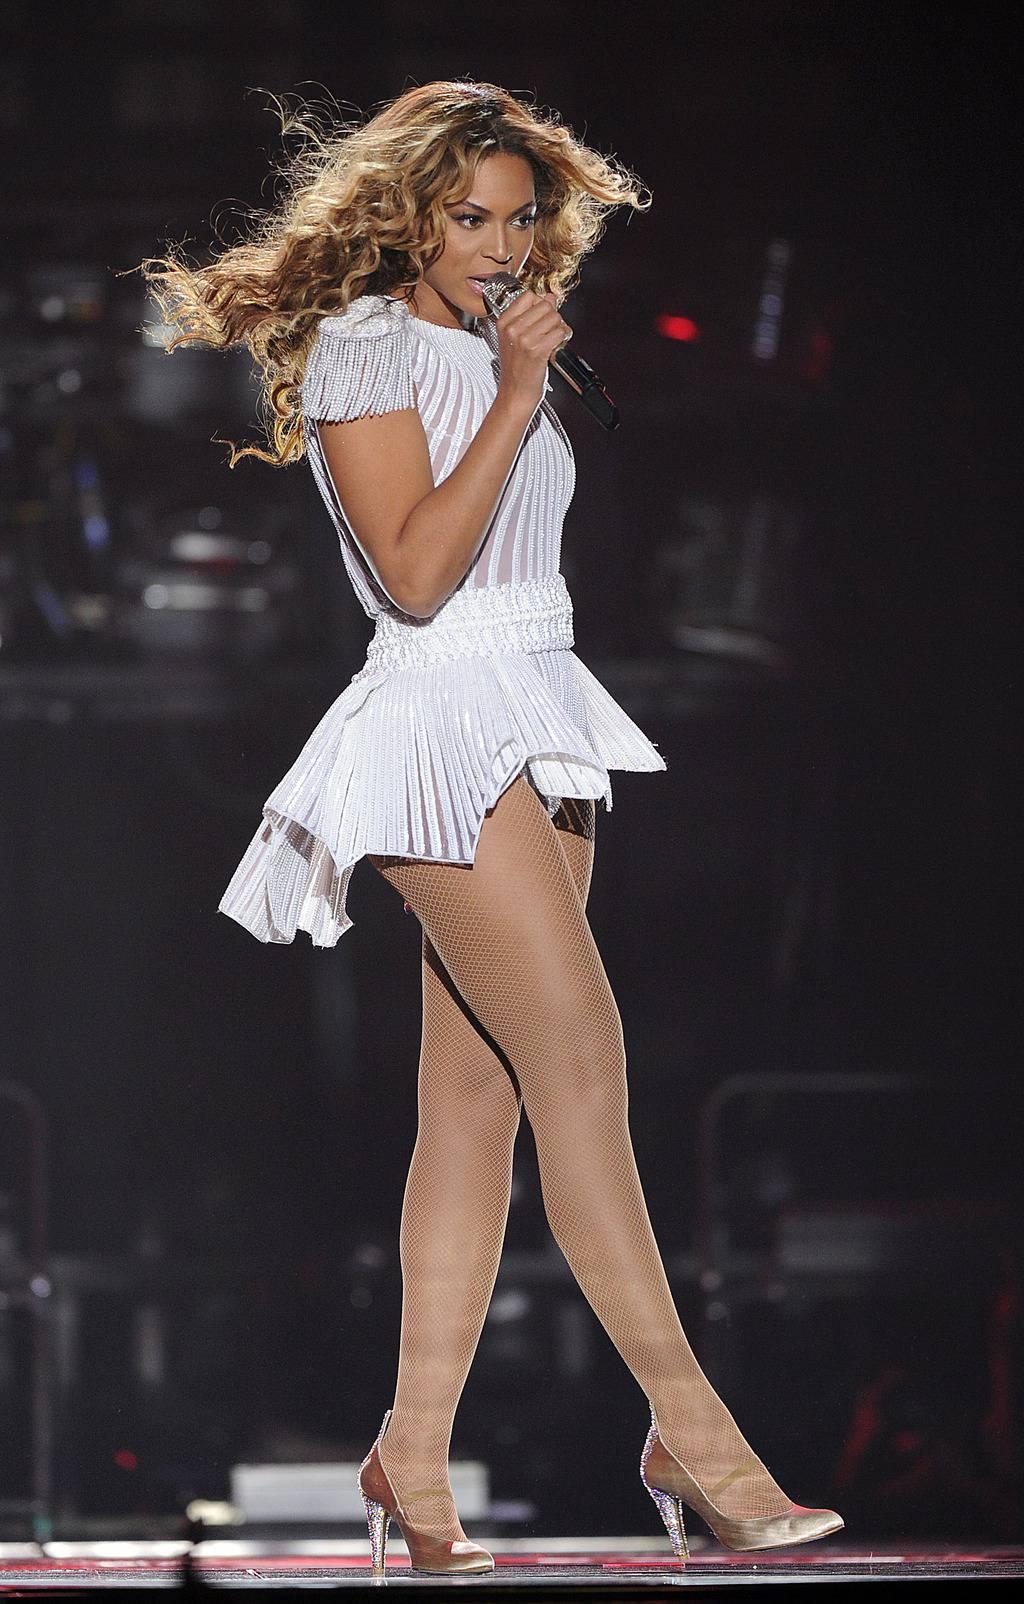 Frank Micelotta, Beyonce official